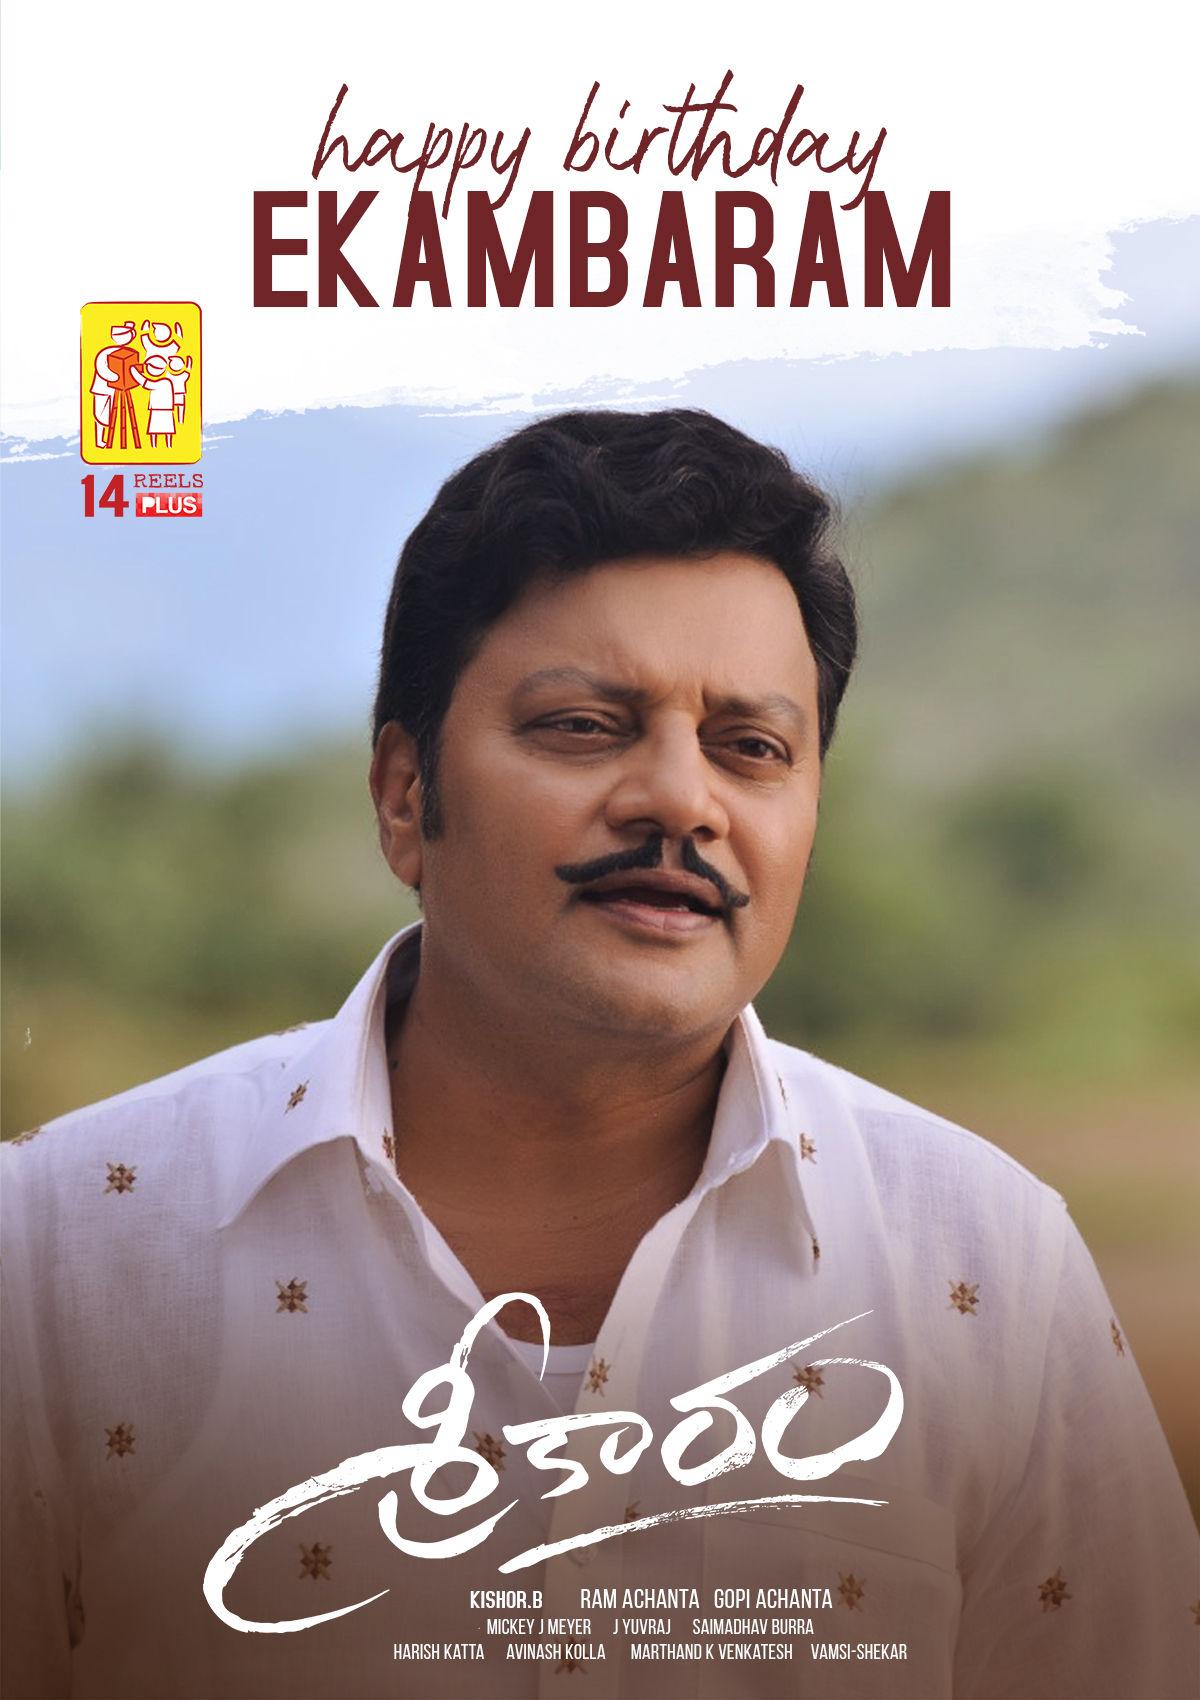 Actor Sai Kumar As Ekambaram In Sreekaram Movie Poster